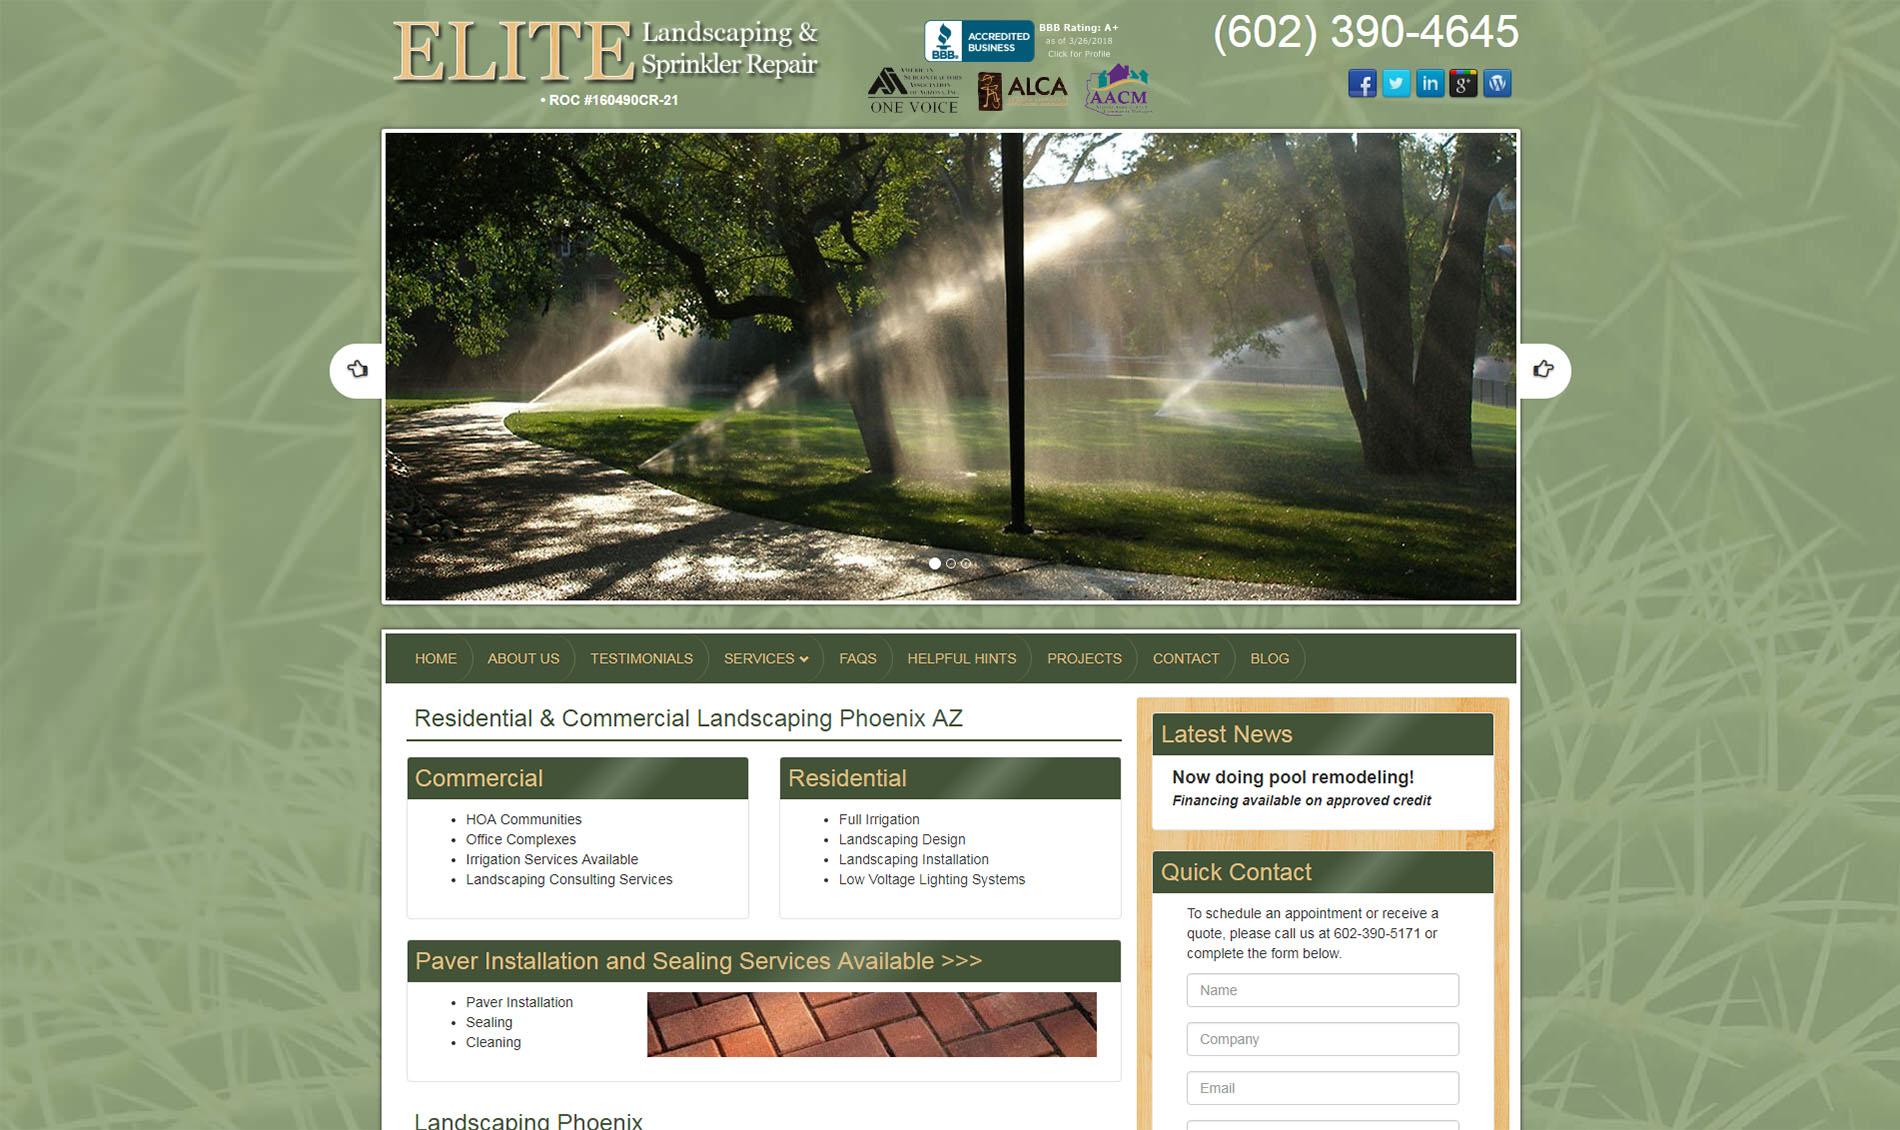 elite-sprinkler